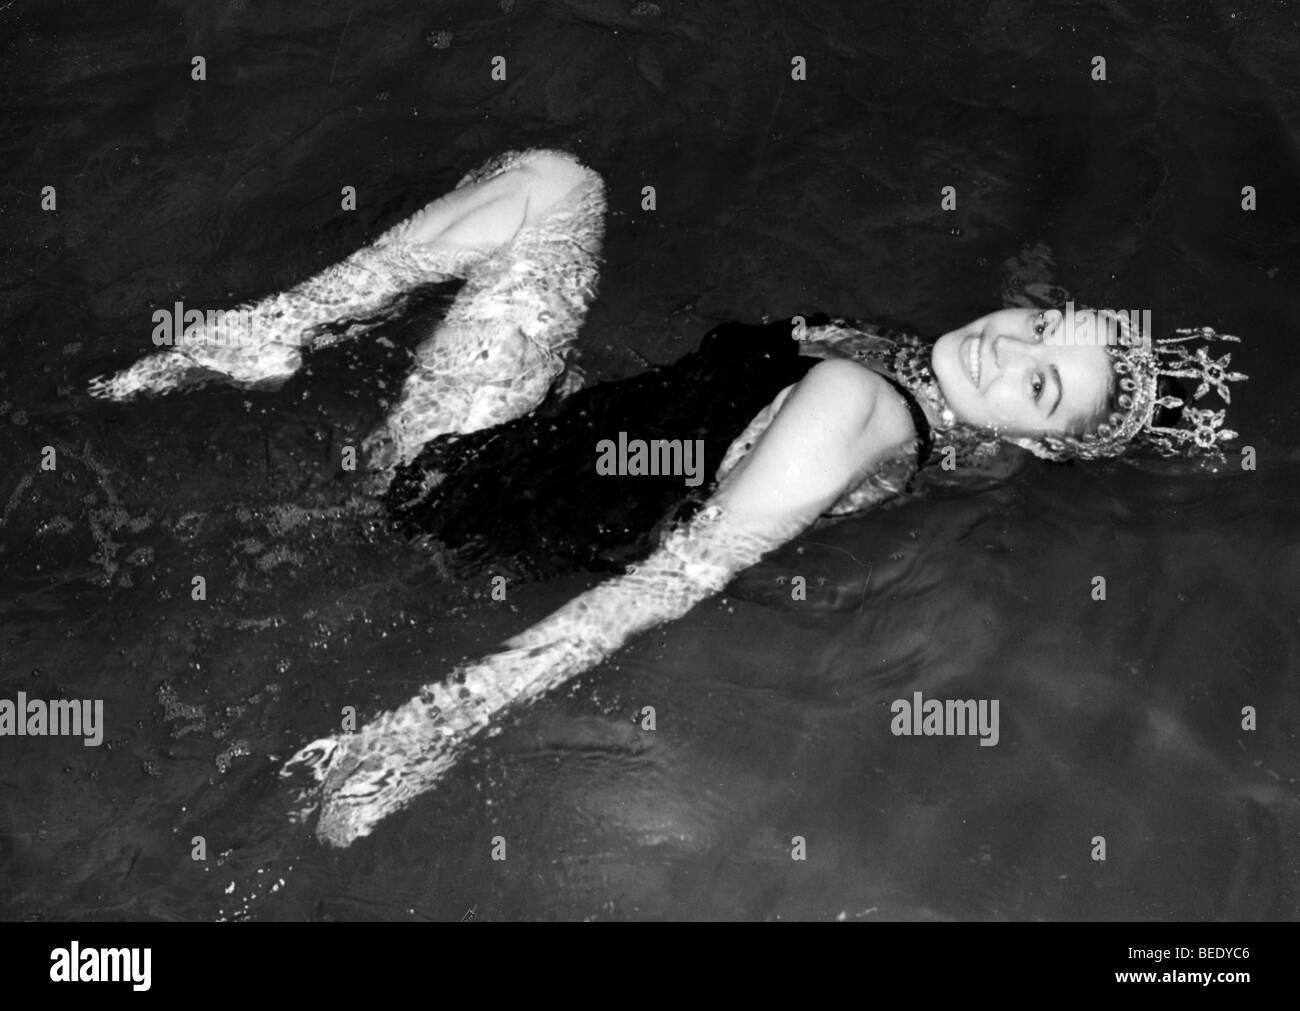 Esther Williams Swimming Pool Stock Photos & Esther Williams ...